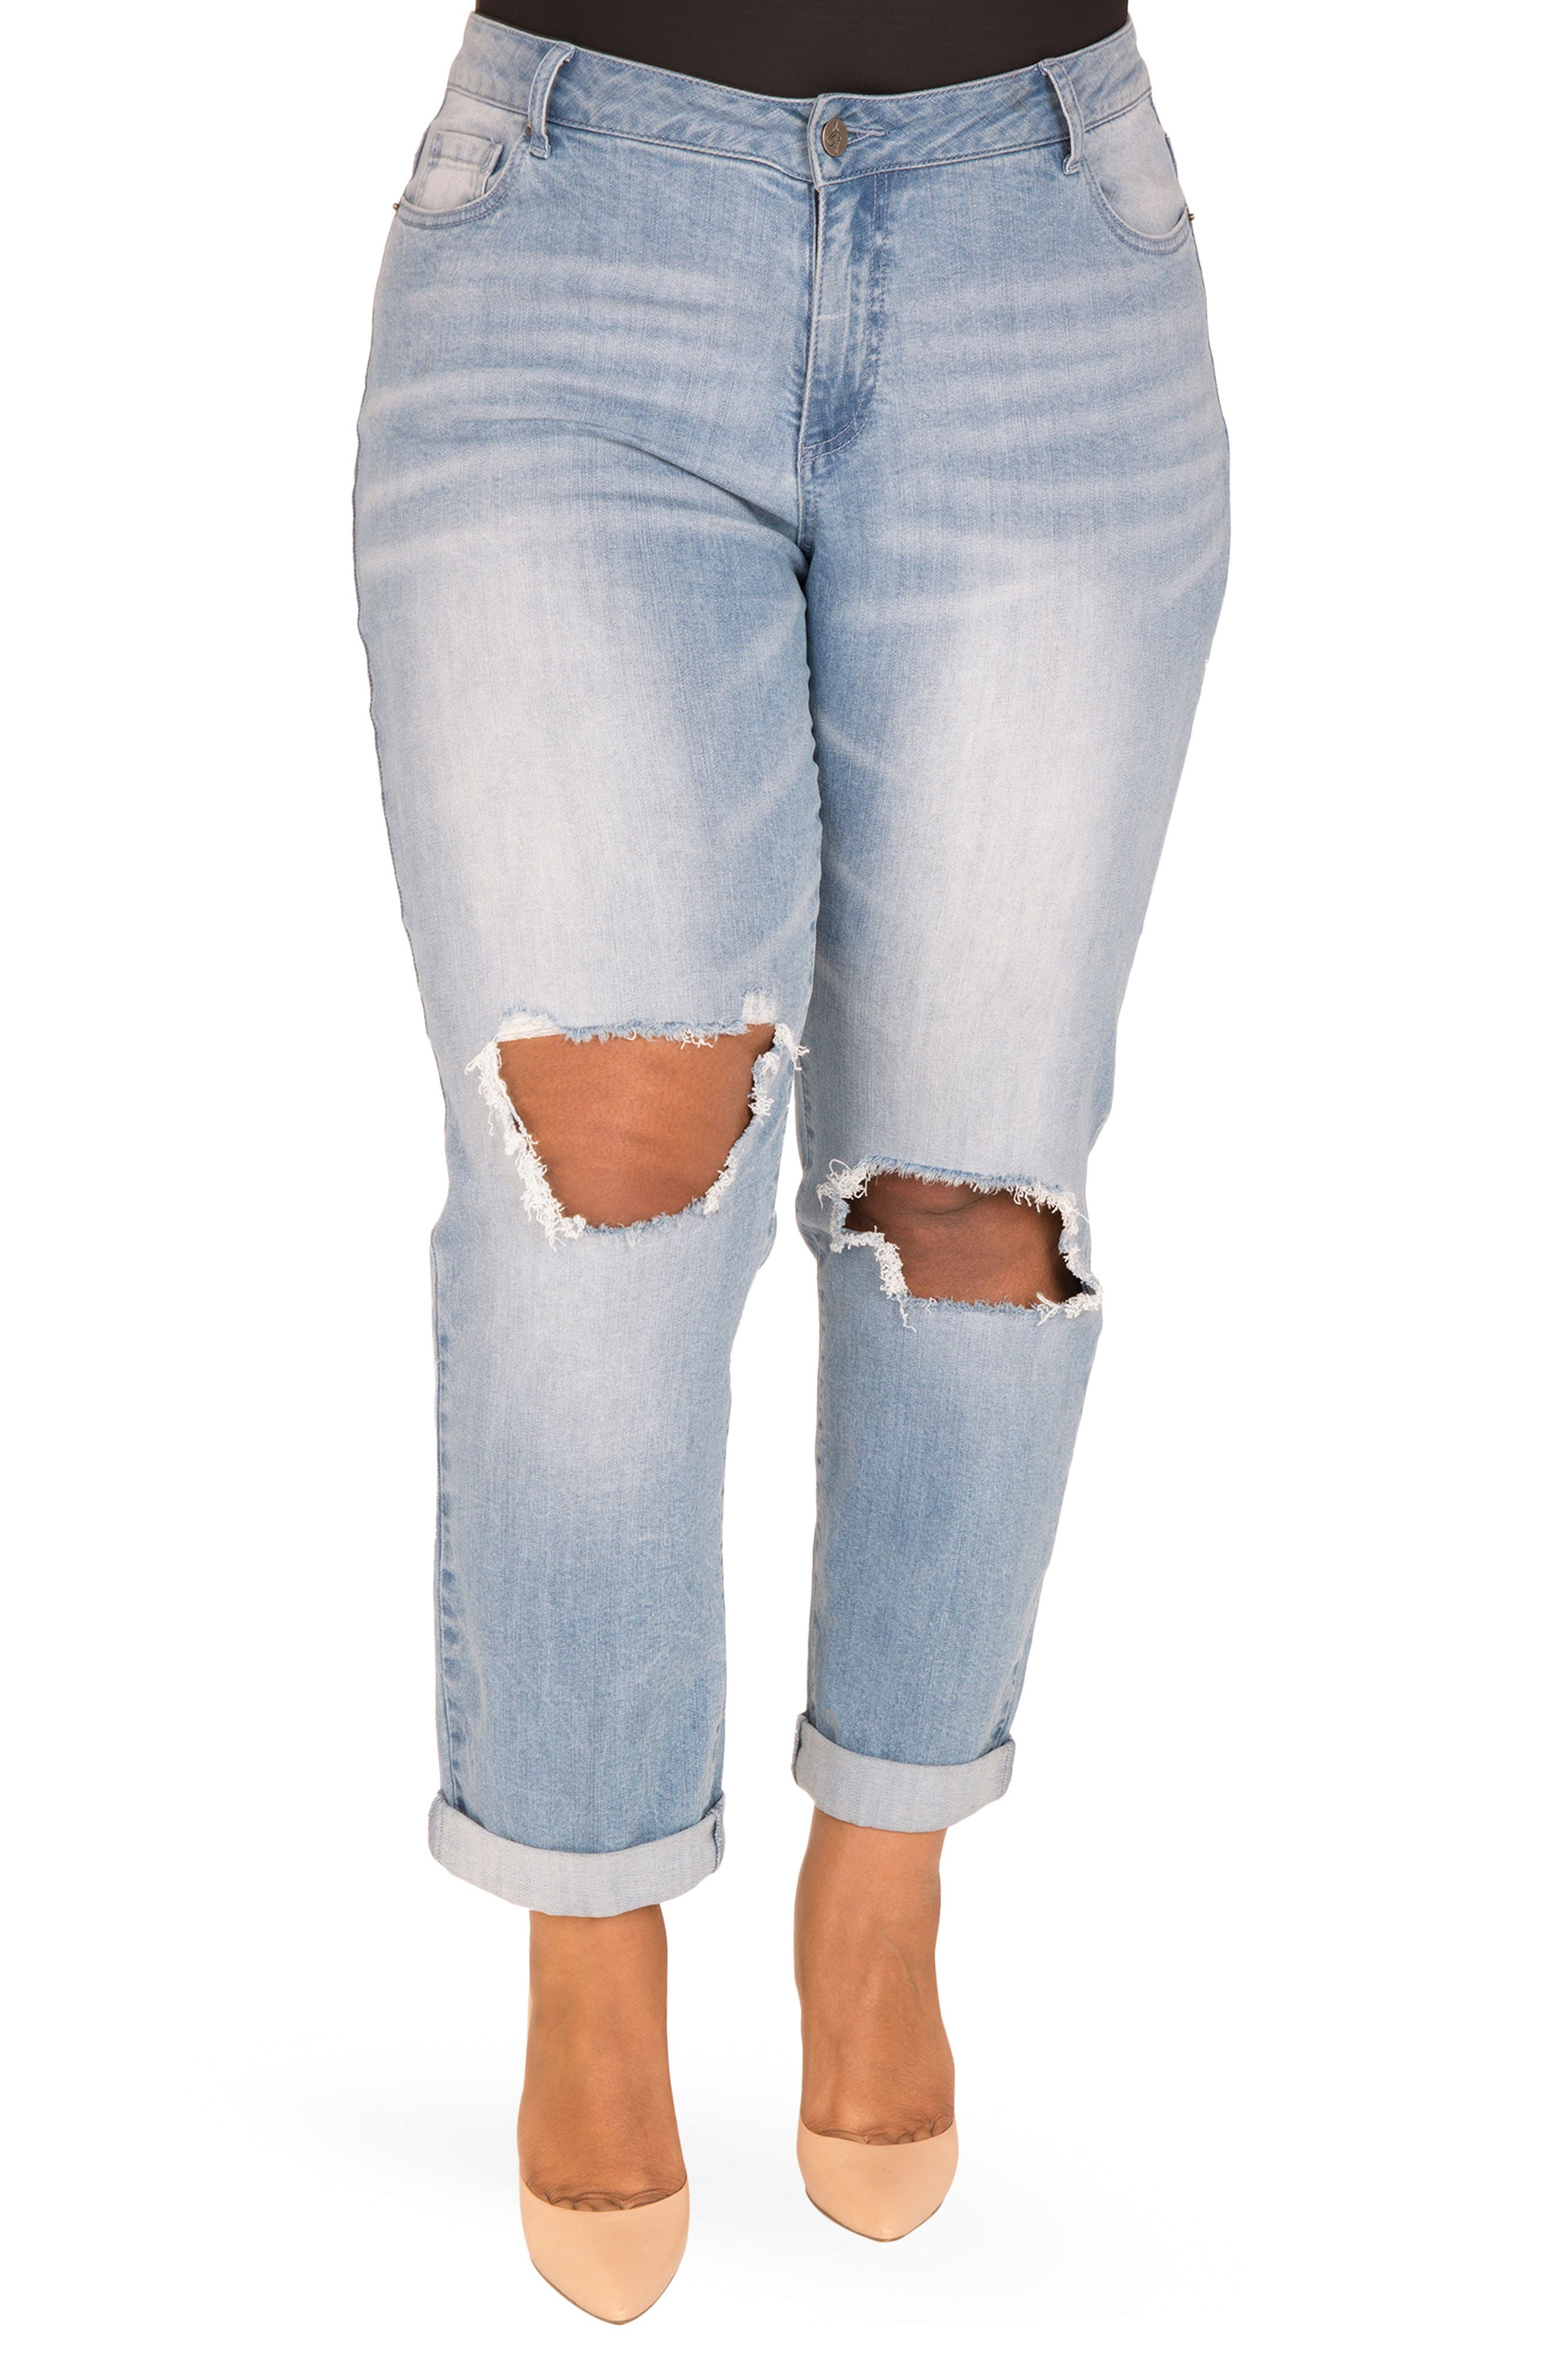 Poetic Justice Verla Destroyed Boyfriend Jeans (Plus Size)